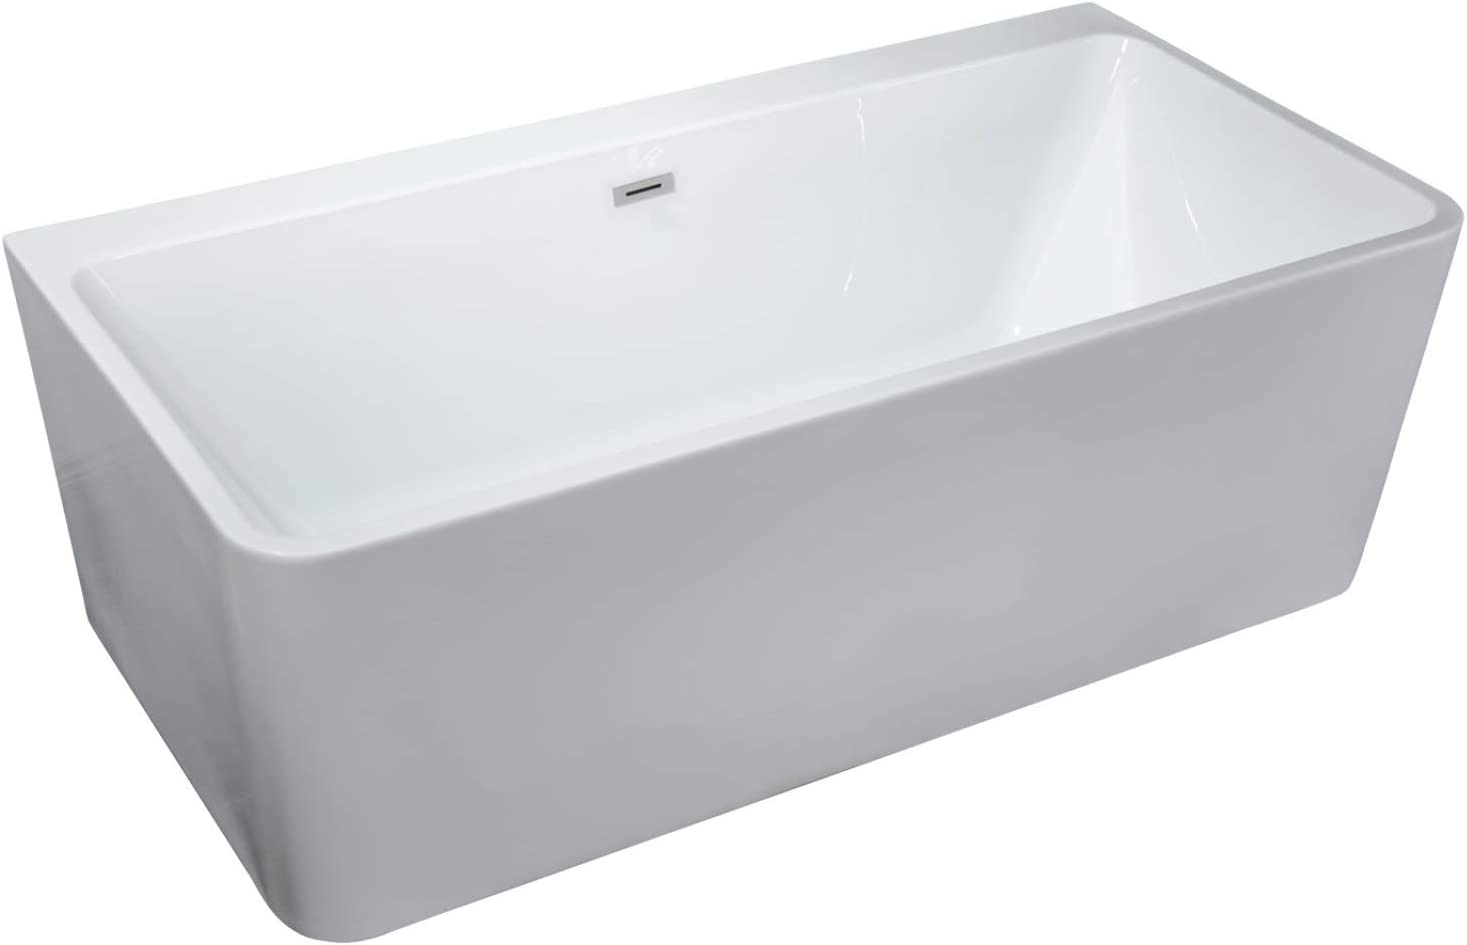 Super intense Challenge the lowest price of Japan SALE Freestanding White Acrylic Modern Bathtub